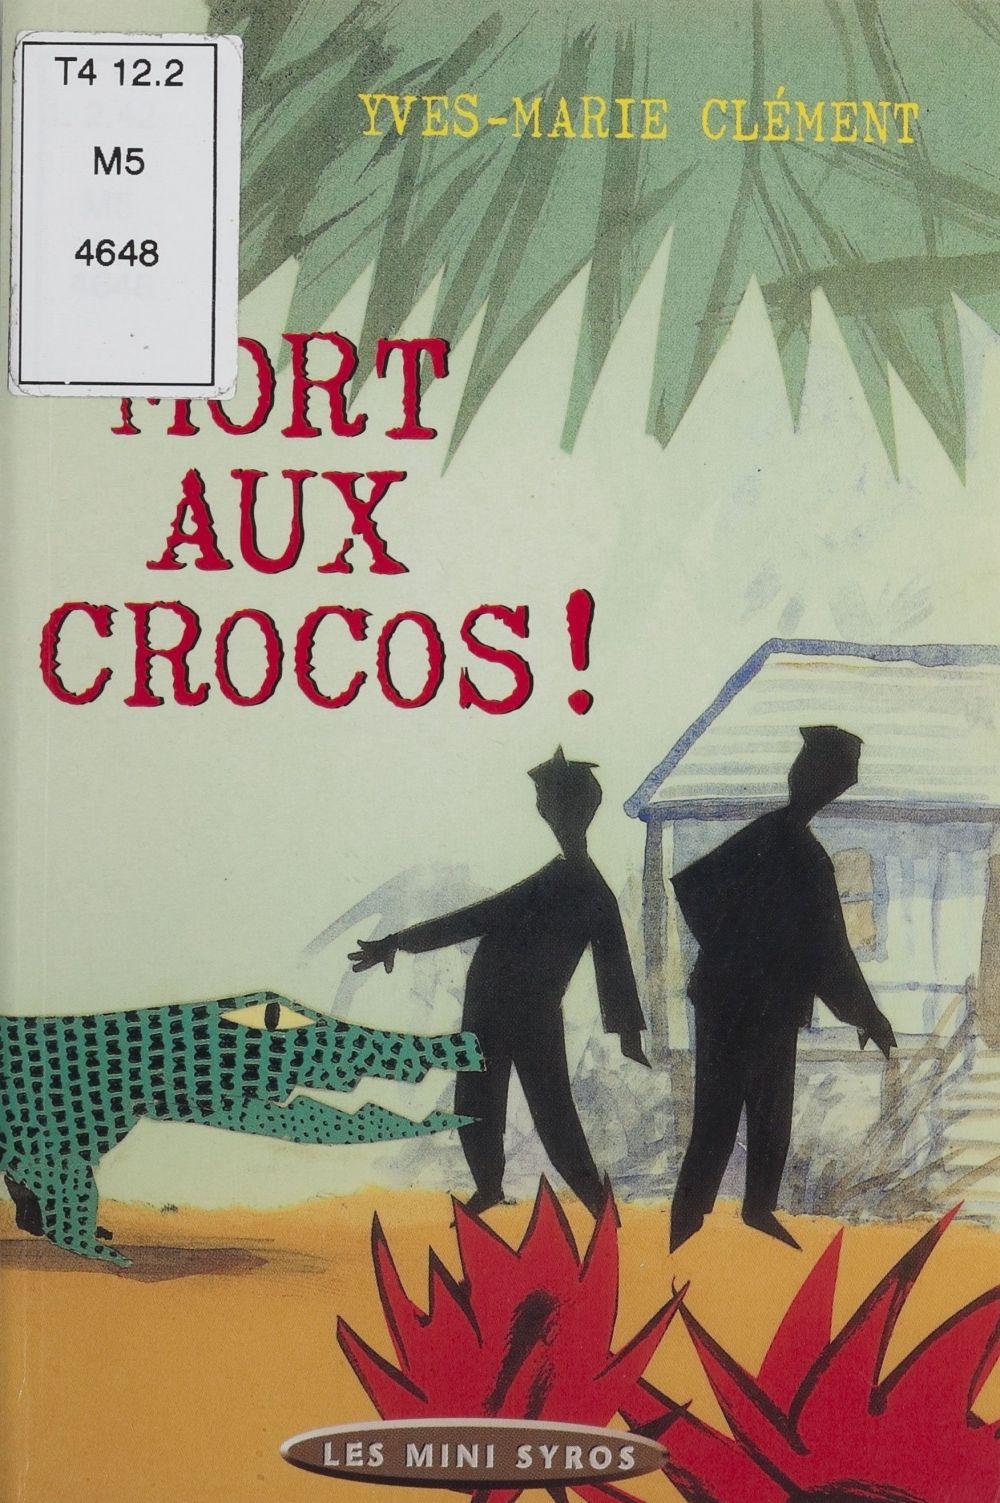 Mort aux crocos